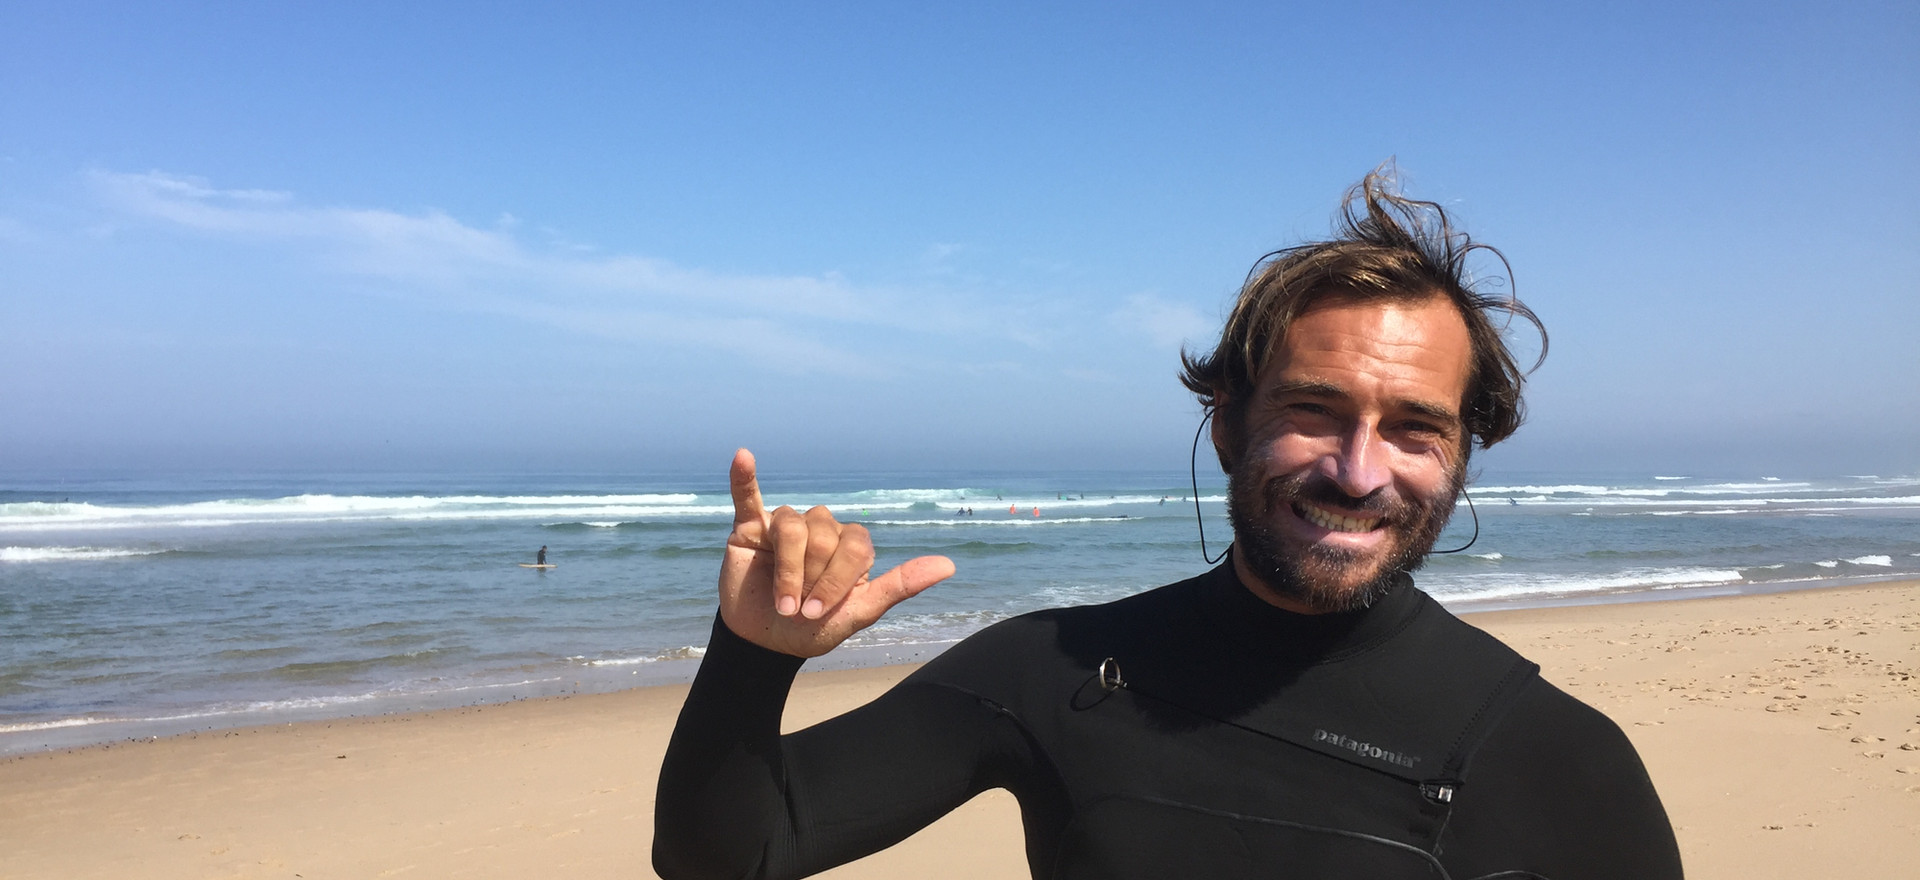 João Macedo Surf School Awake retreat Sintra